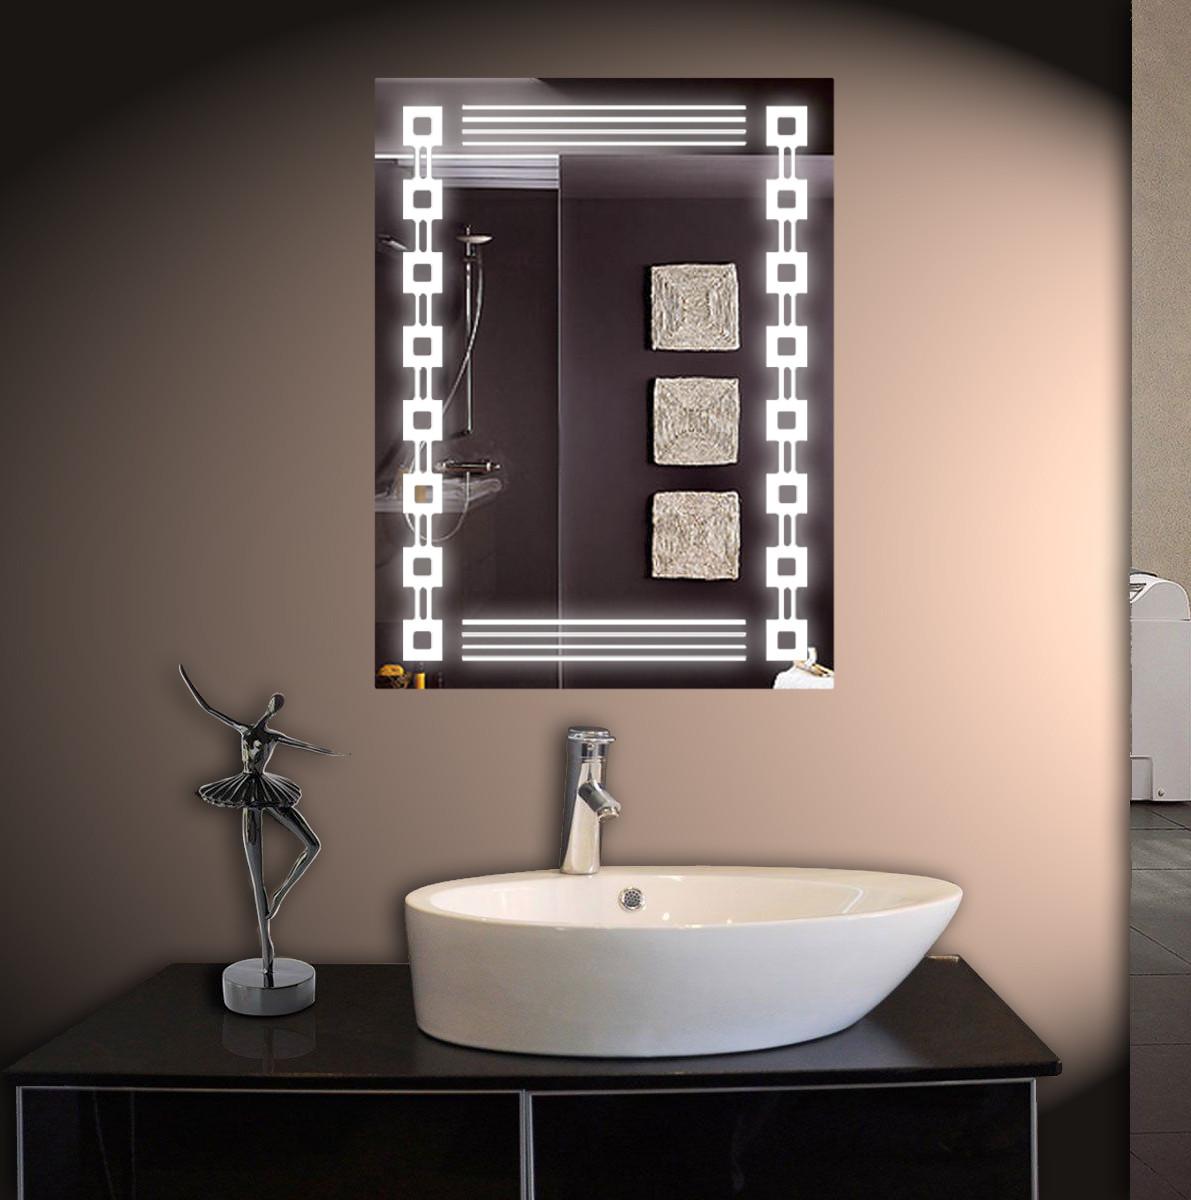 Зеркало LED со светодиодной подсветкой ver-3010 600х800 мм